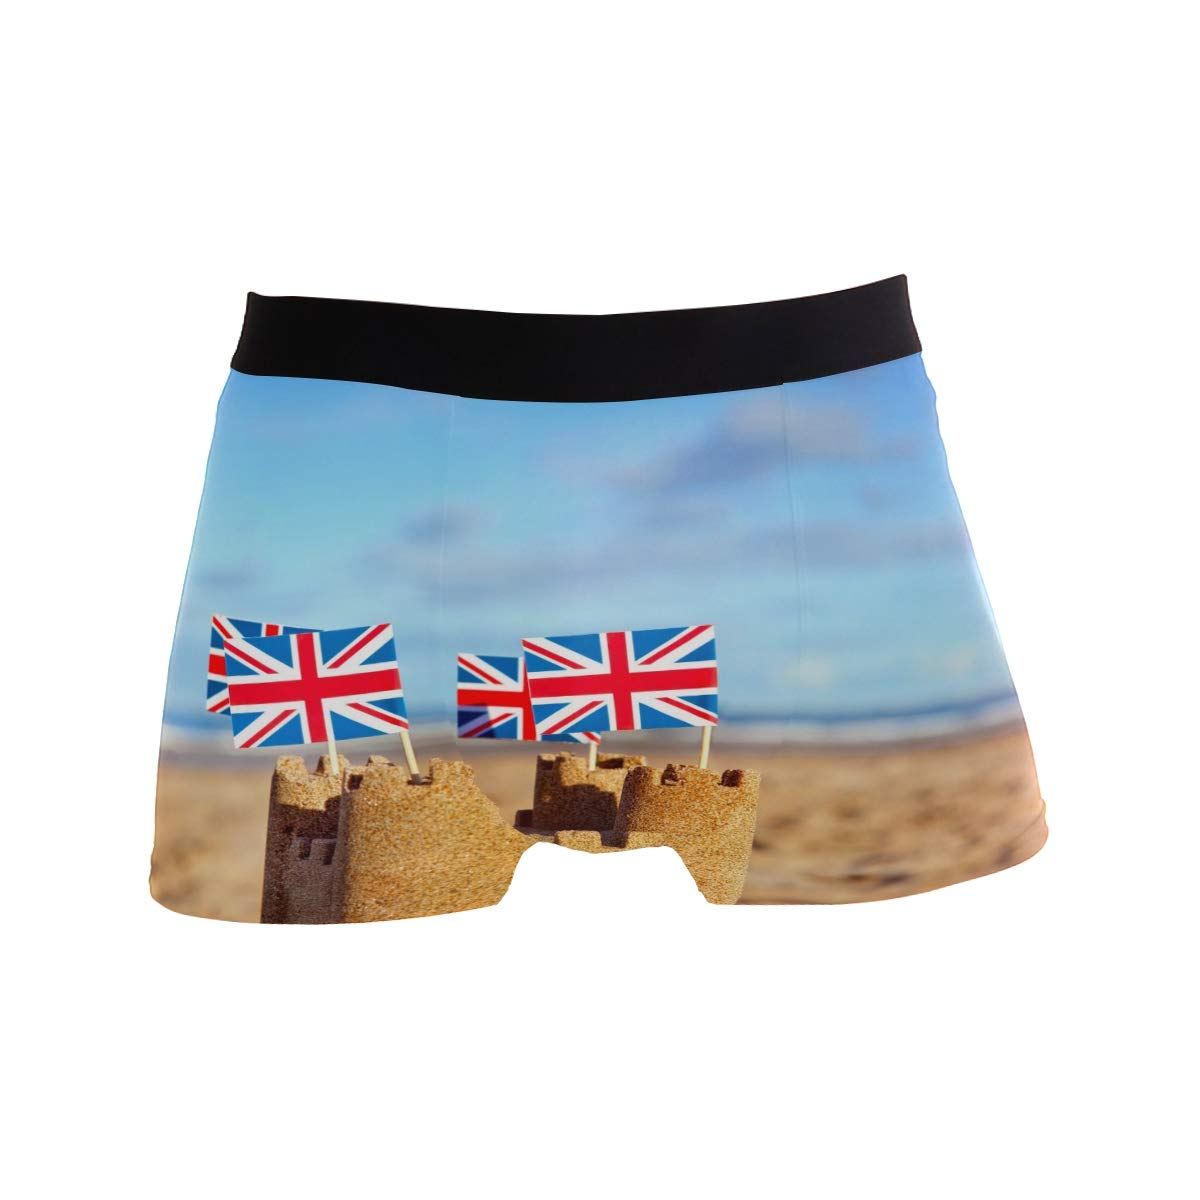 ZZKKO Castle British Flag Mens Boxer Briefs Underwear Breathable Stretch Boxer Trunk with Pouch S-XL